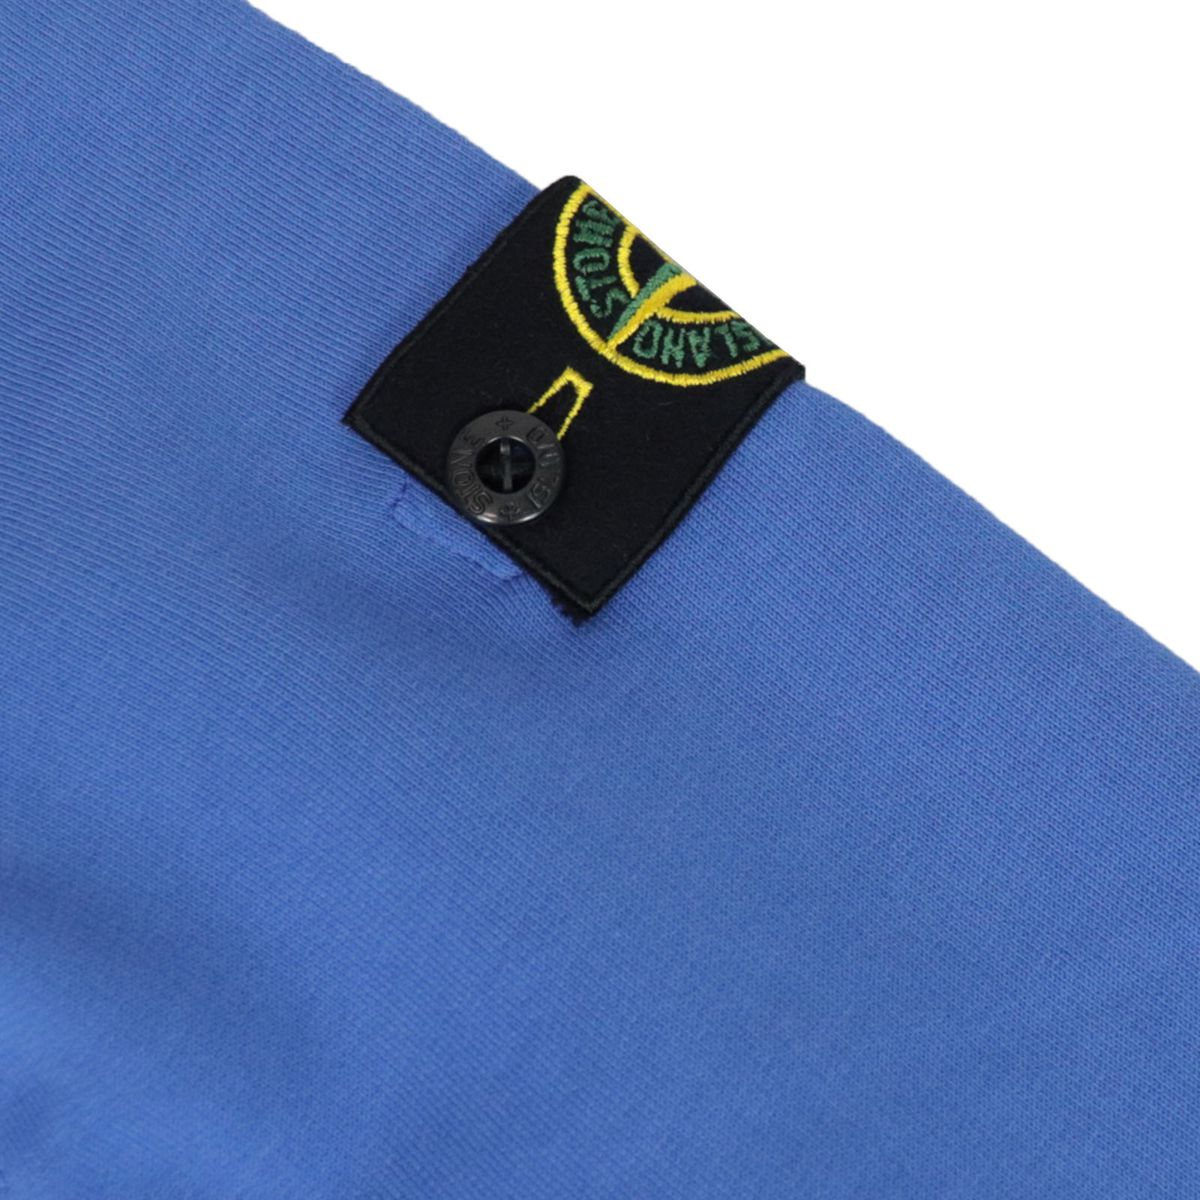 Crewneck cotton sweatshirt with logo patch Ink STONE ISLAND JUNIOR